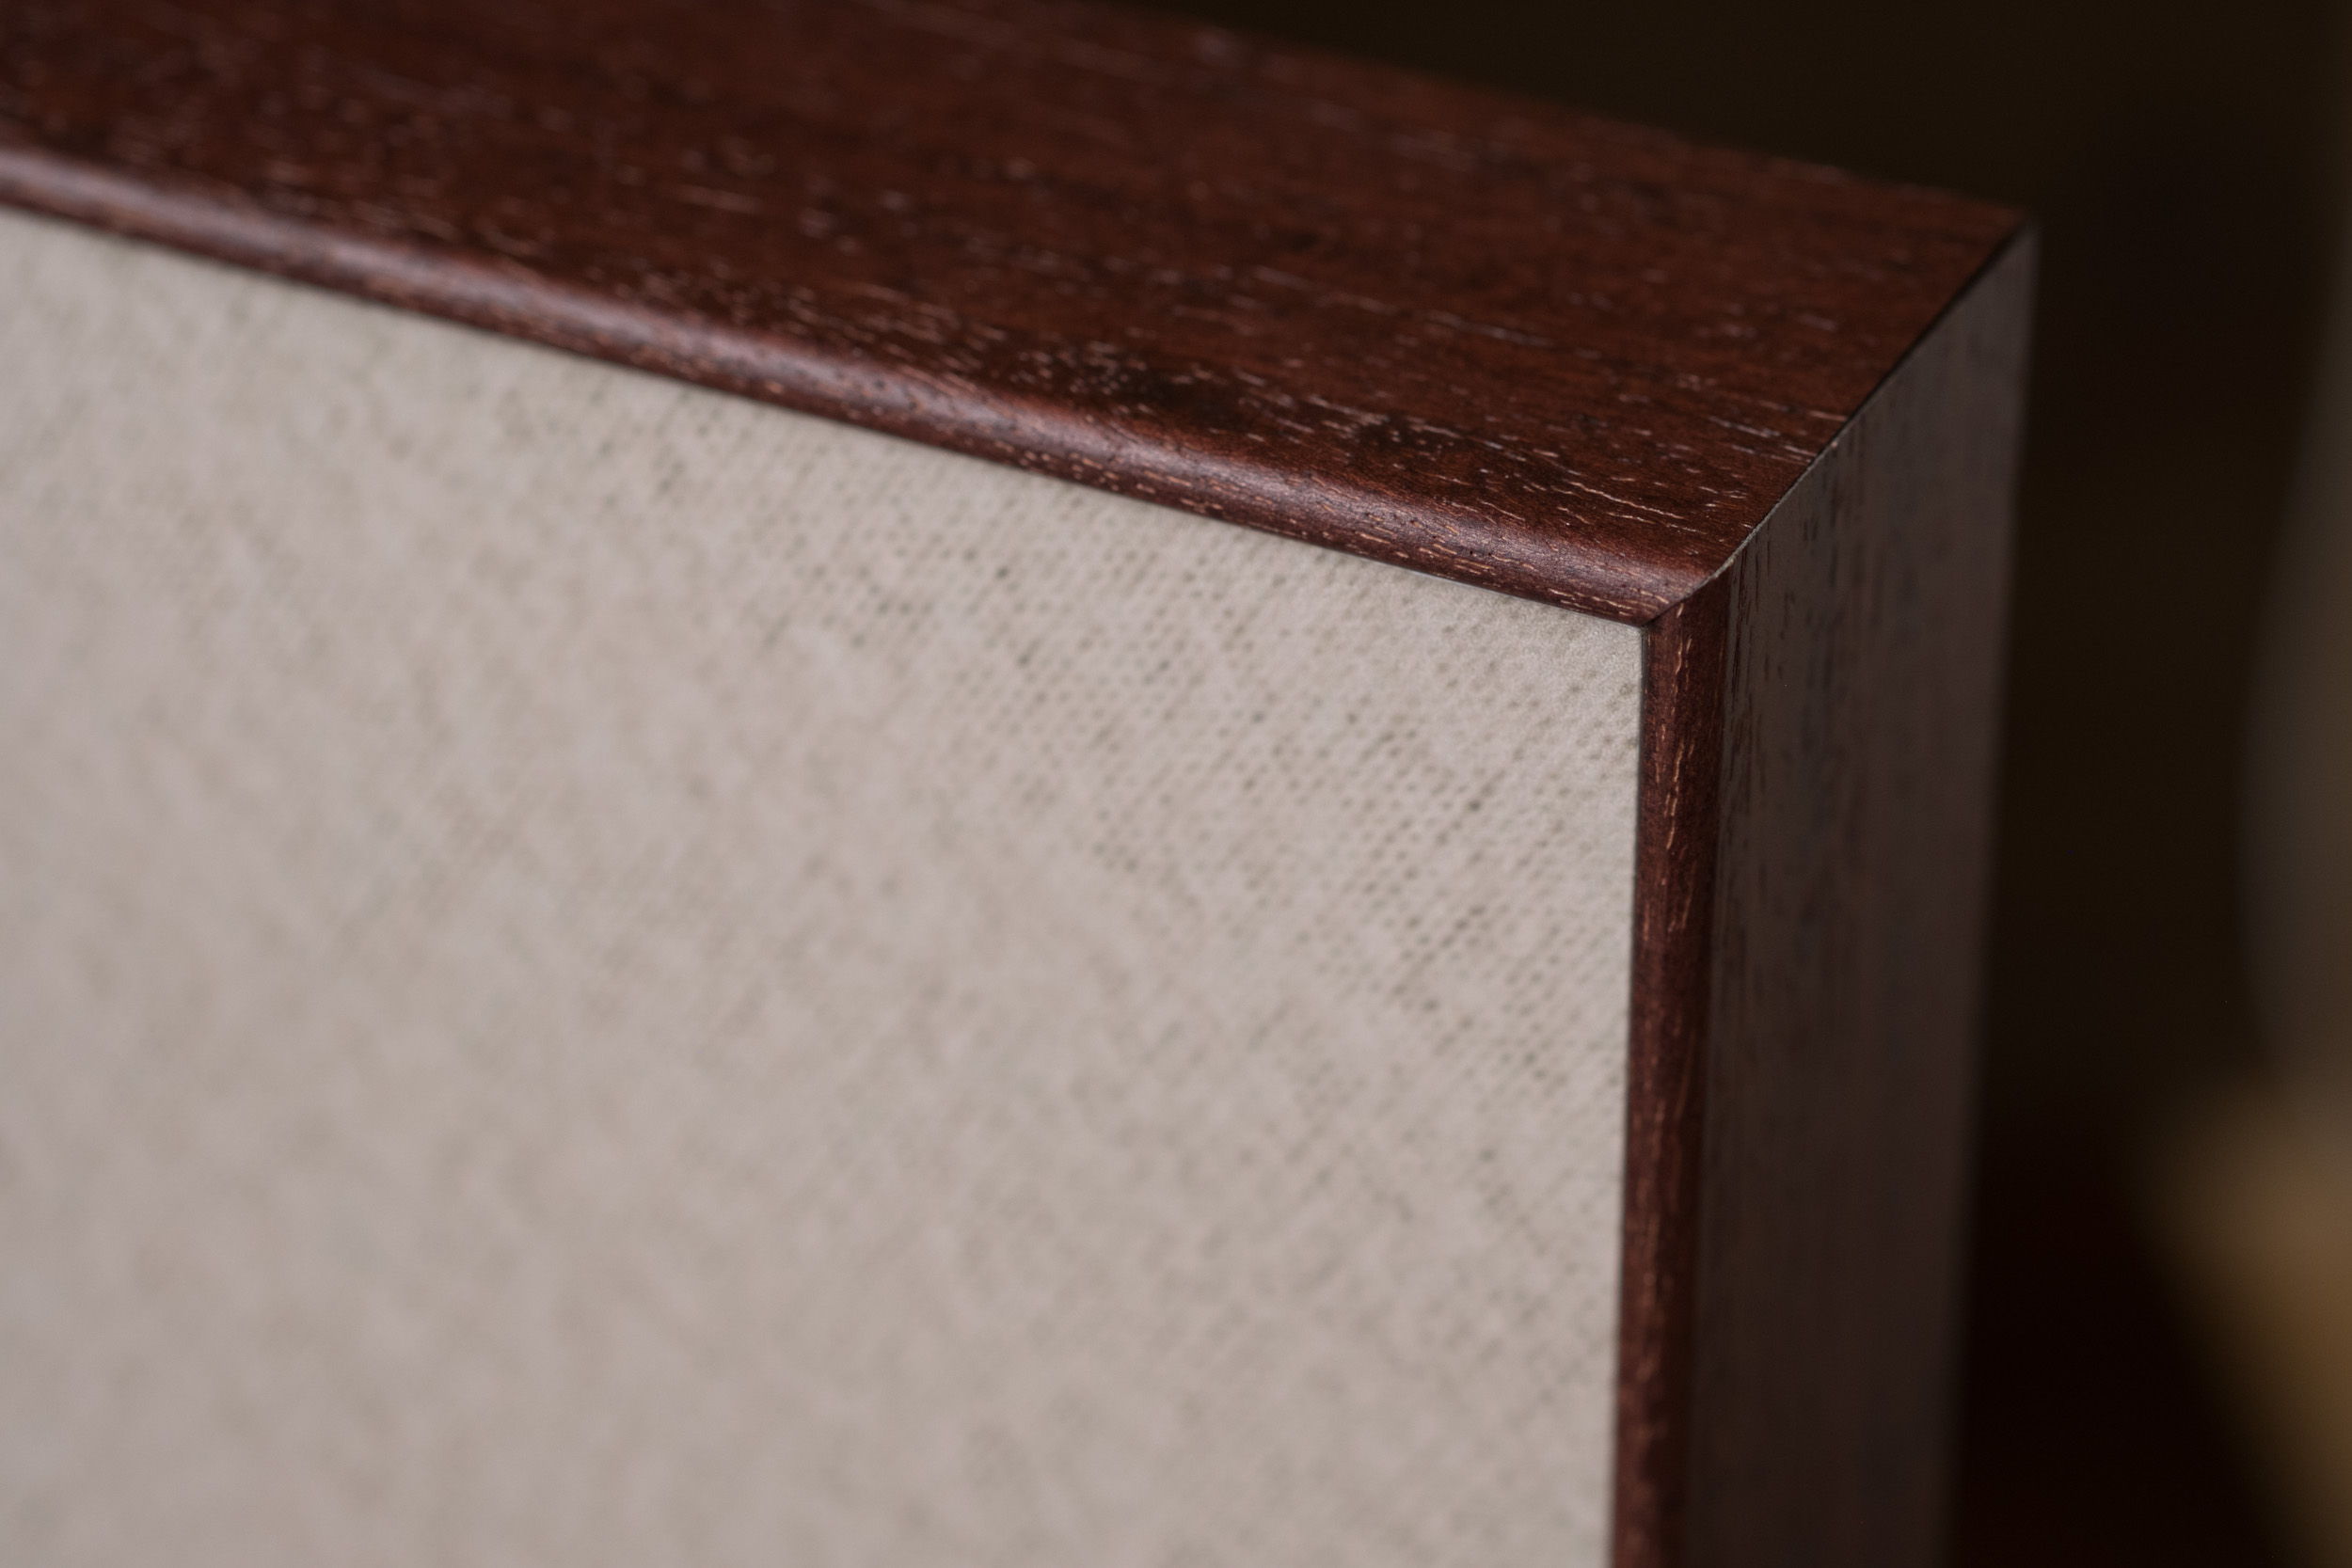 Newborn-Photography-Lincoln-Wood-Metal-Edge-Box-Frame-002.jpg